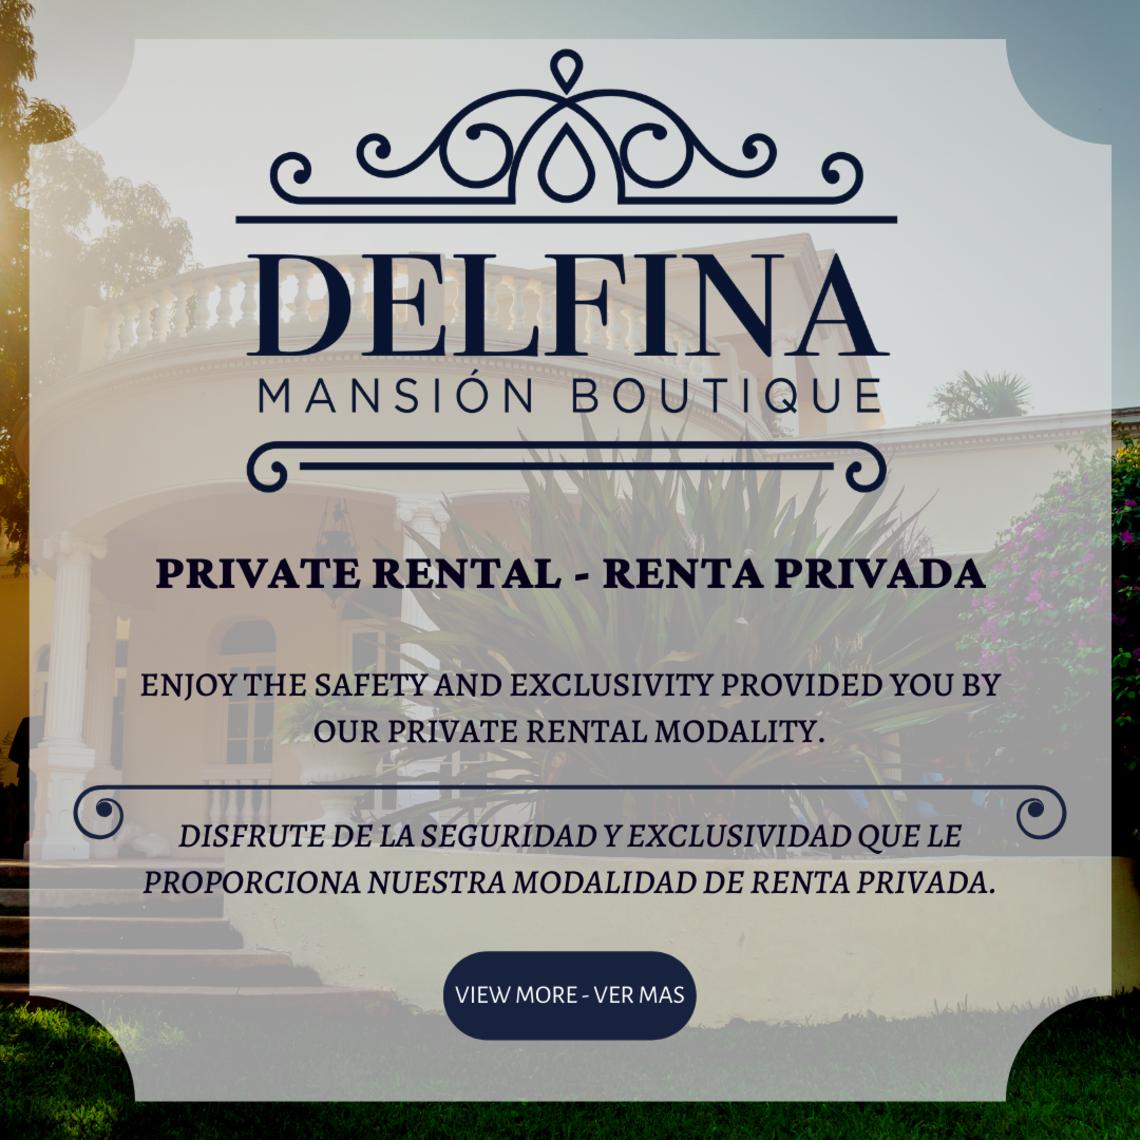 Renta privada hotel boutique